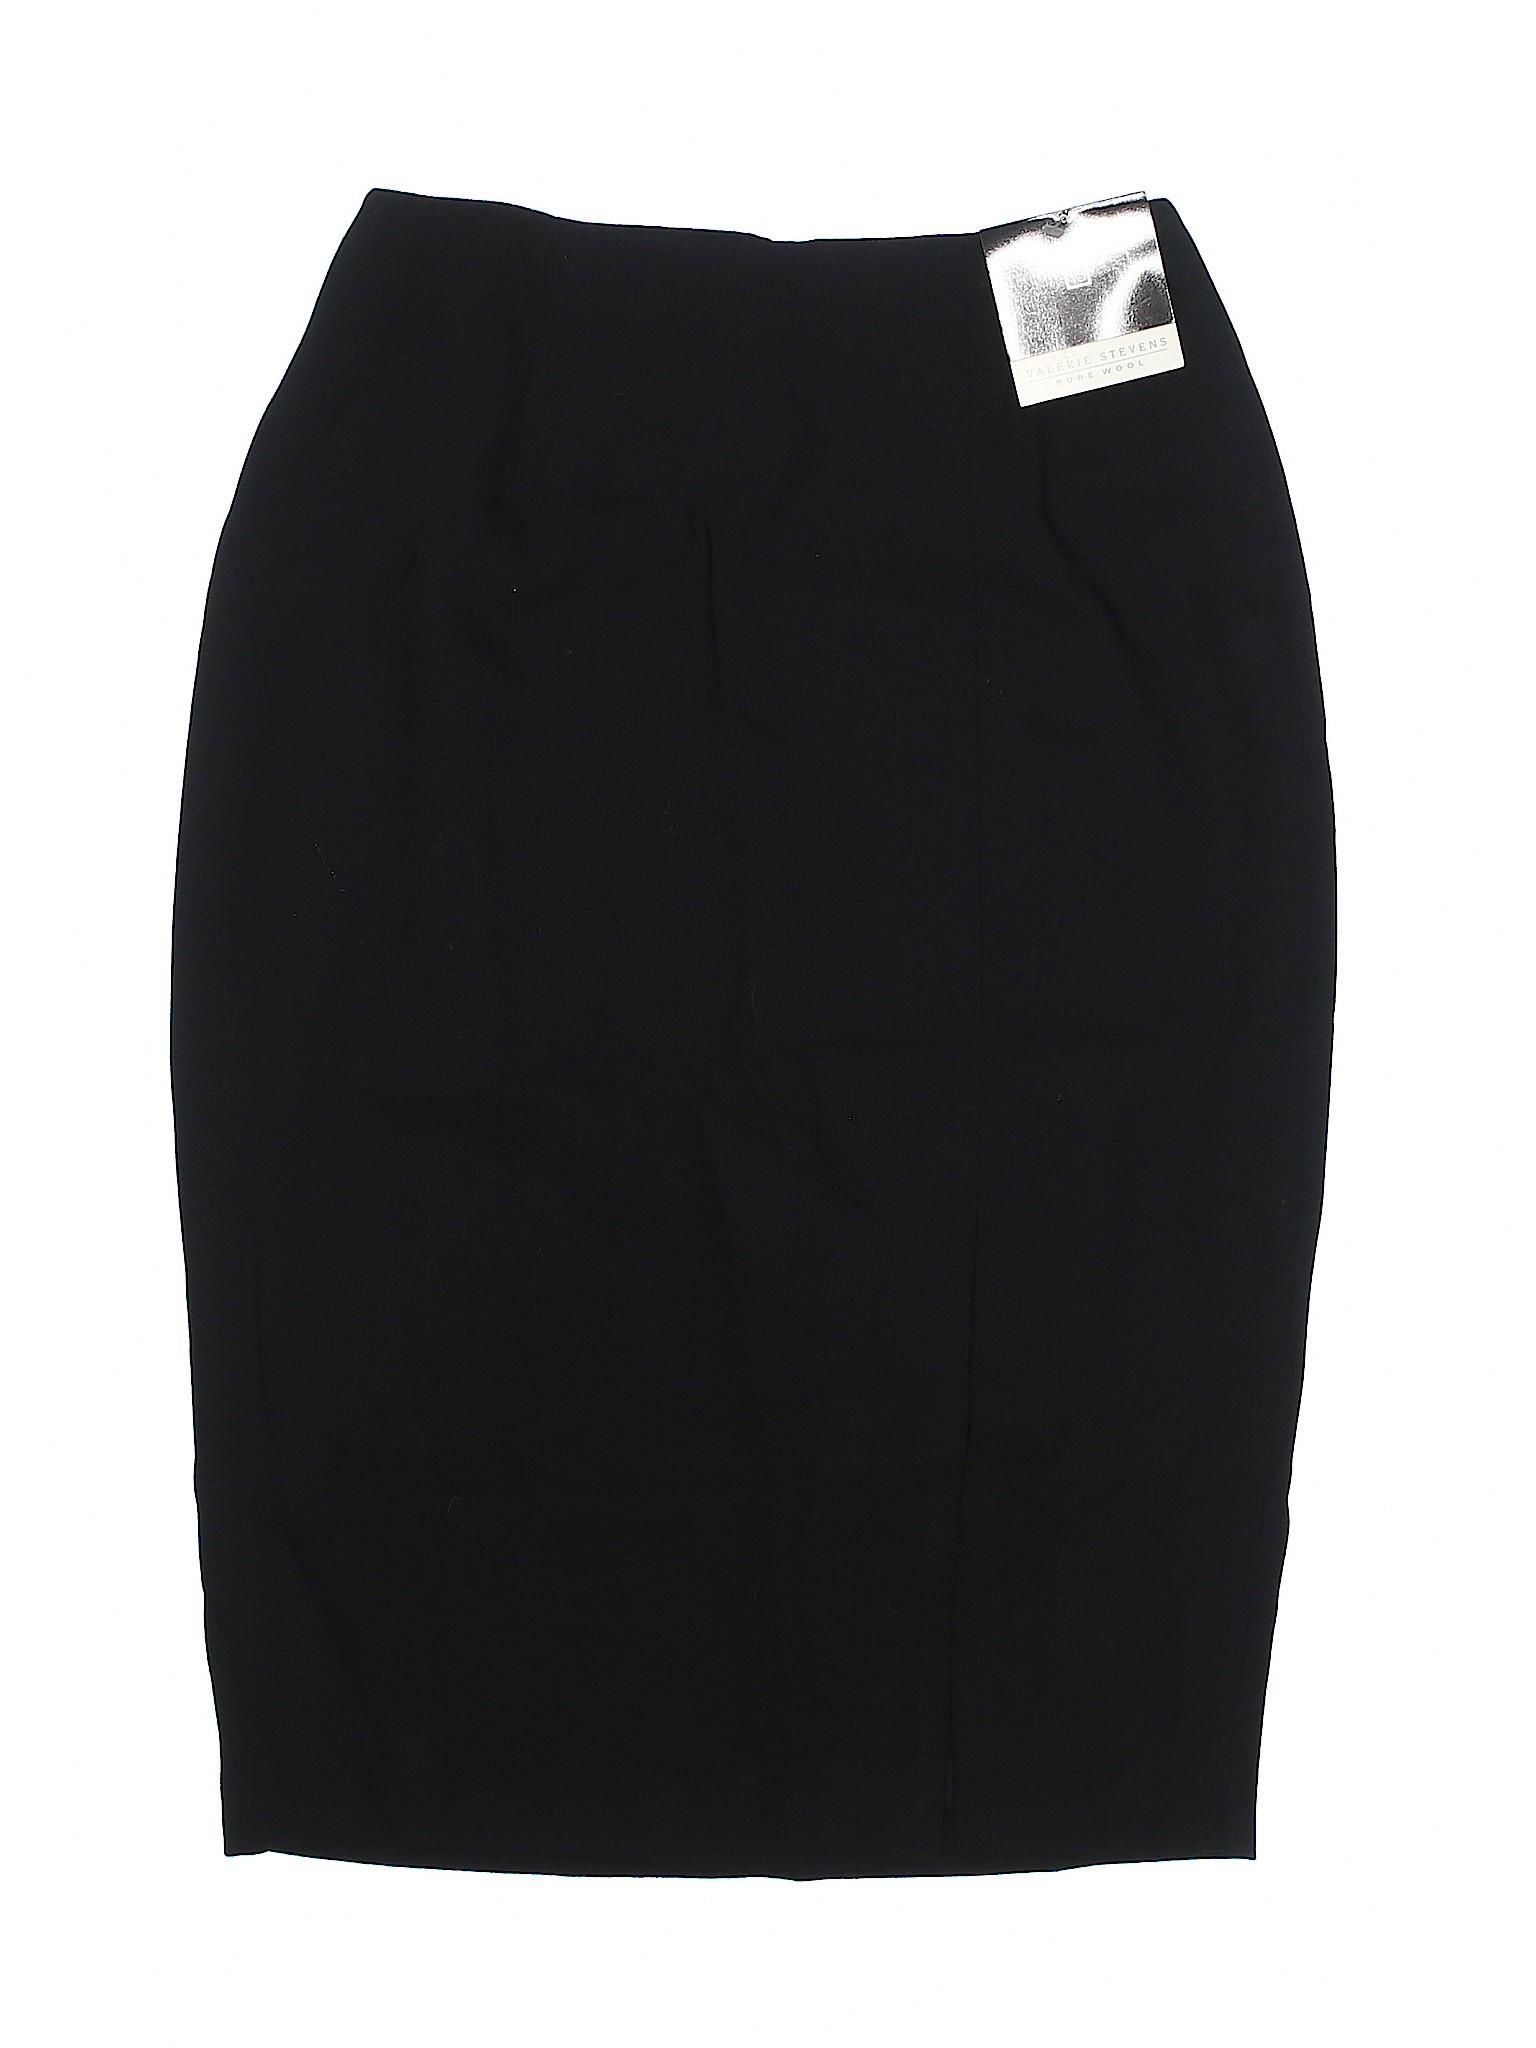 Boutique Skirt Wool Skirt Boutique Wool Wool Boutique Wool Boutique Skirt qqvrxw46